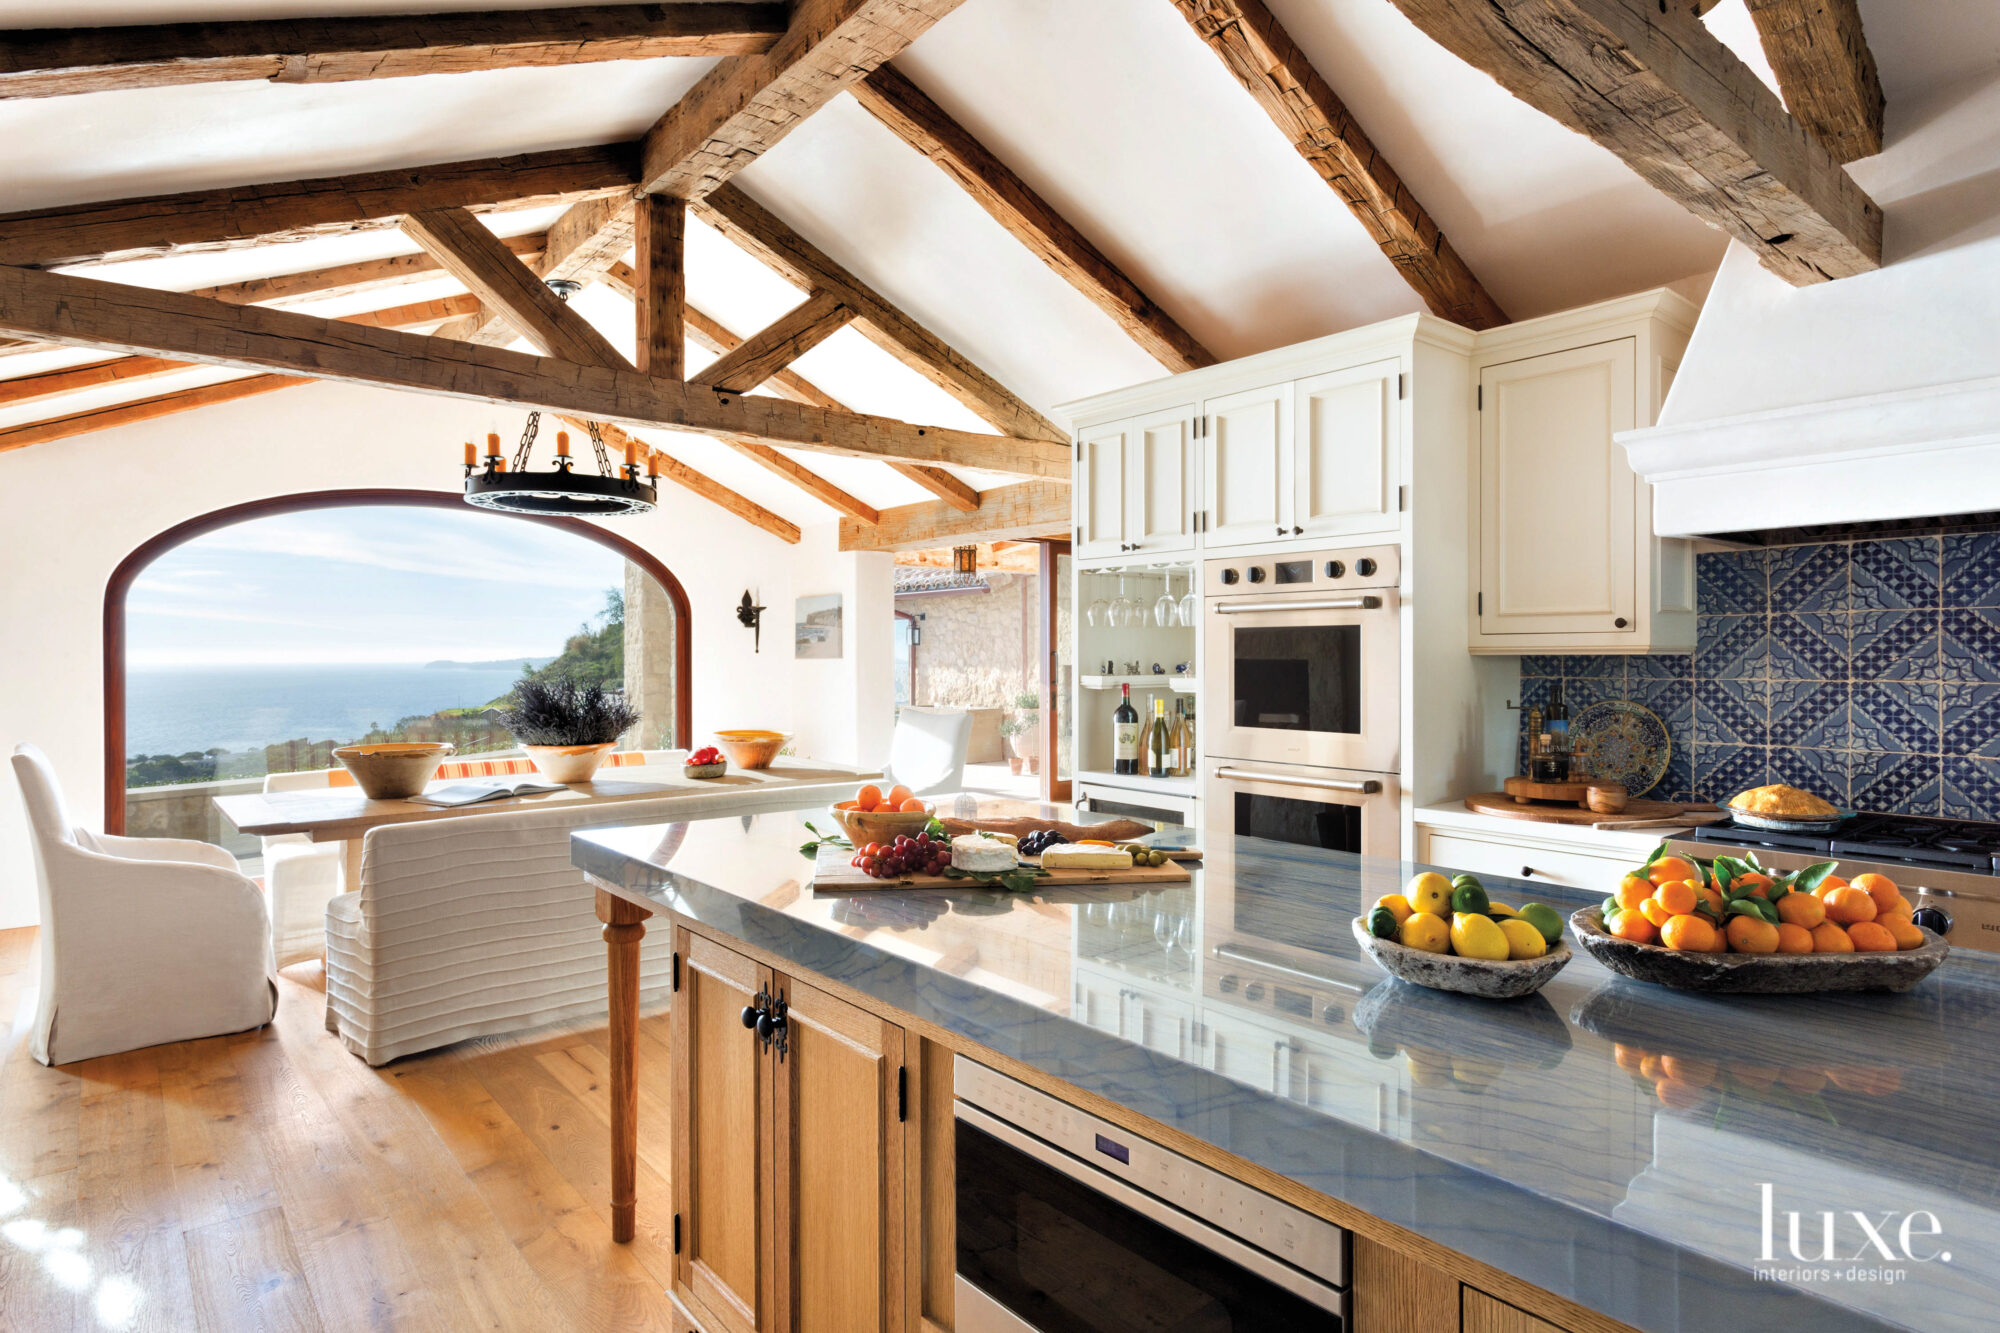 Shot of kitchen facing toward view